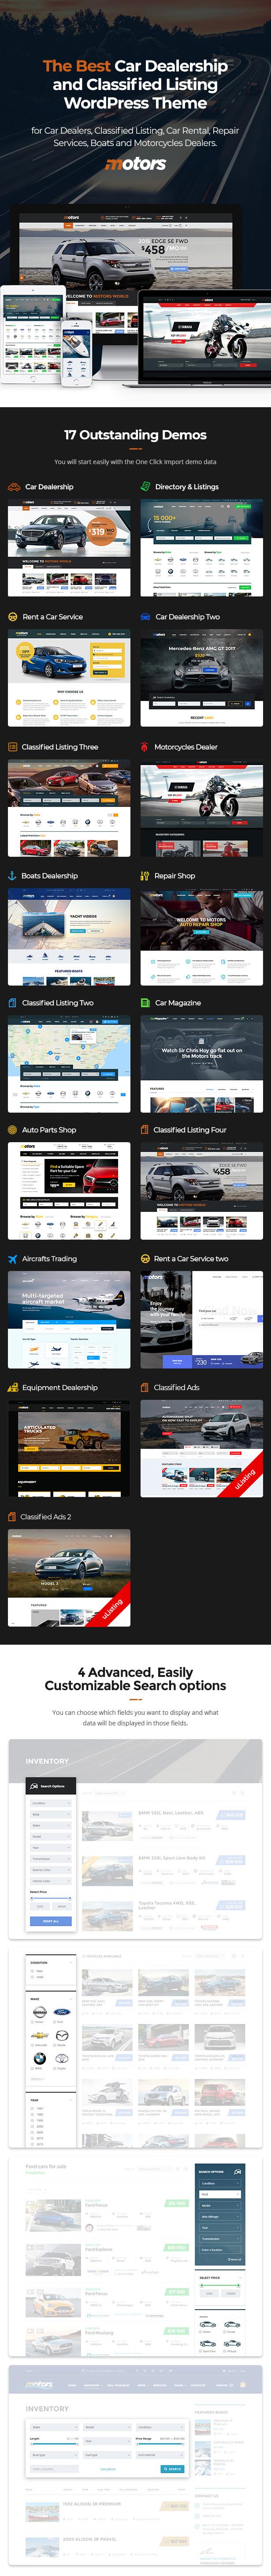 Motors - Car Dealer, Rental & Classifieds WordPress theme - 4